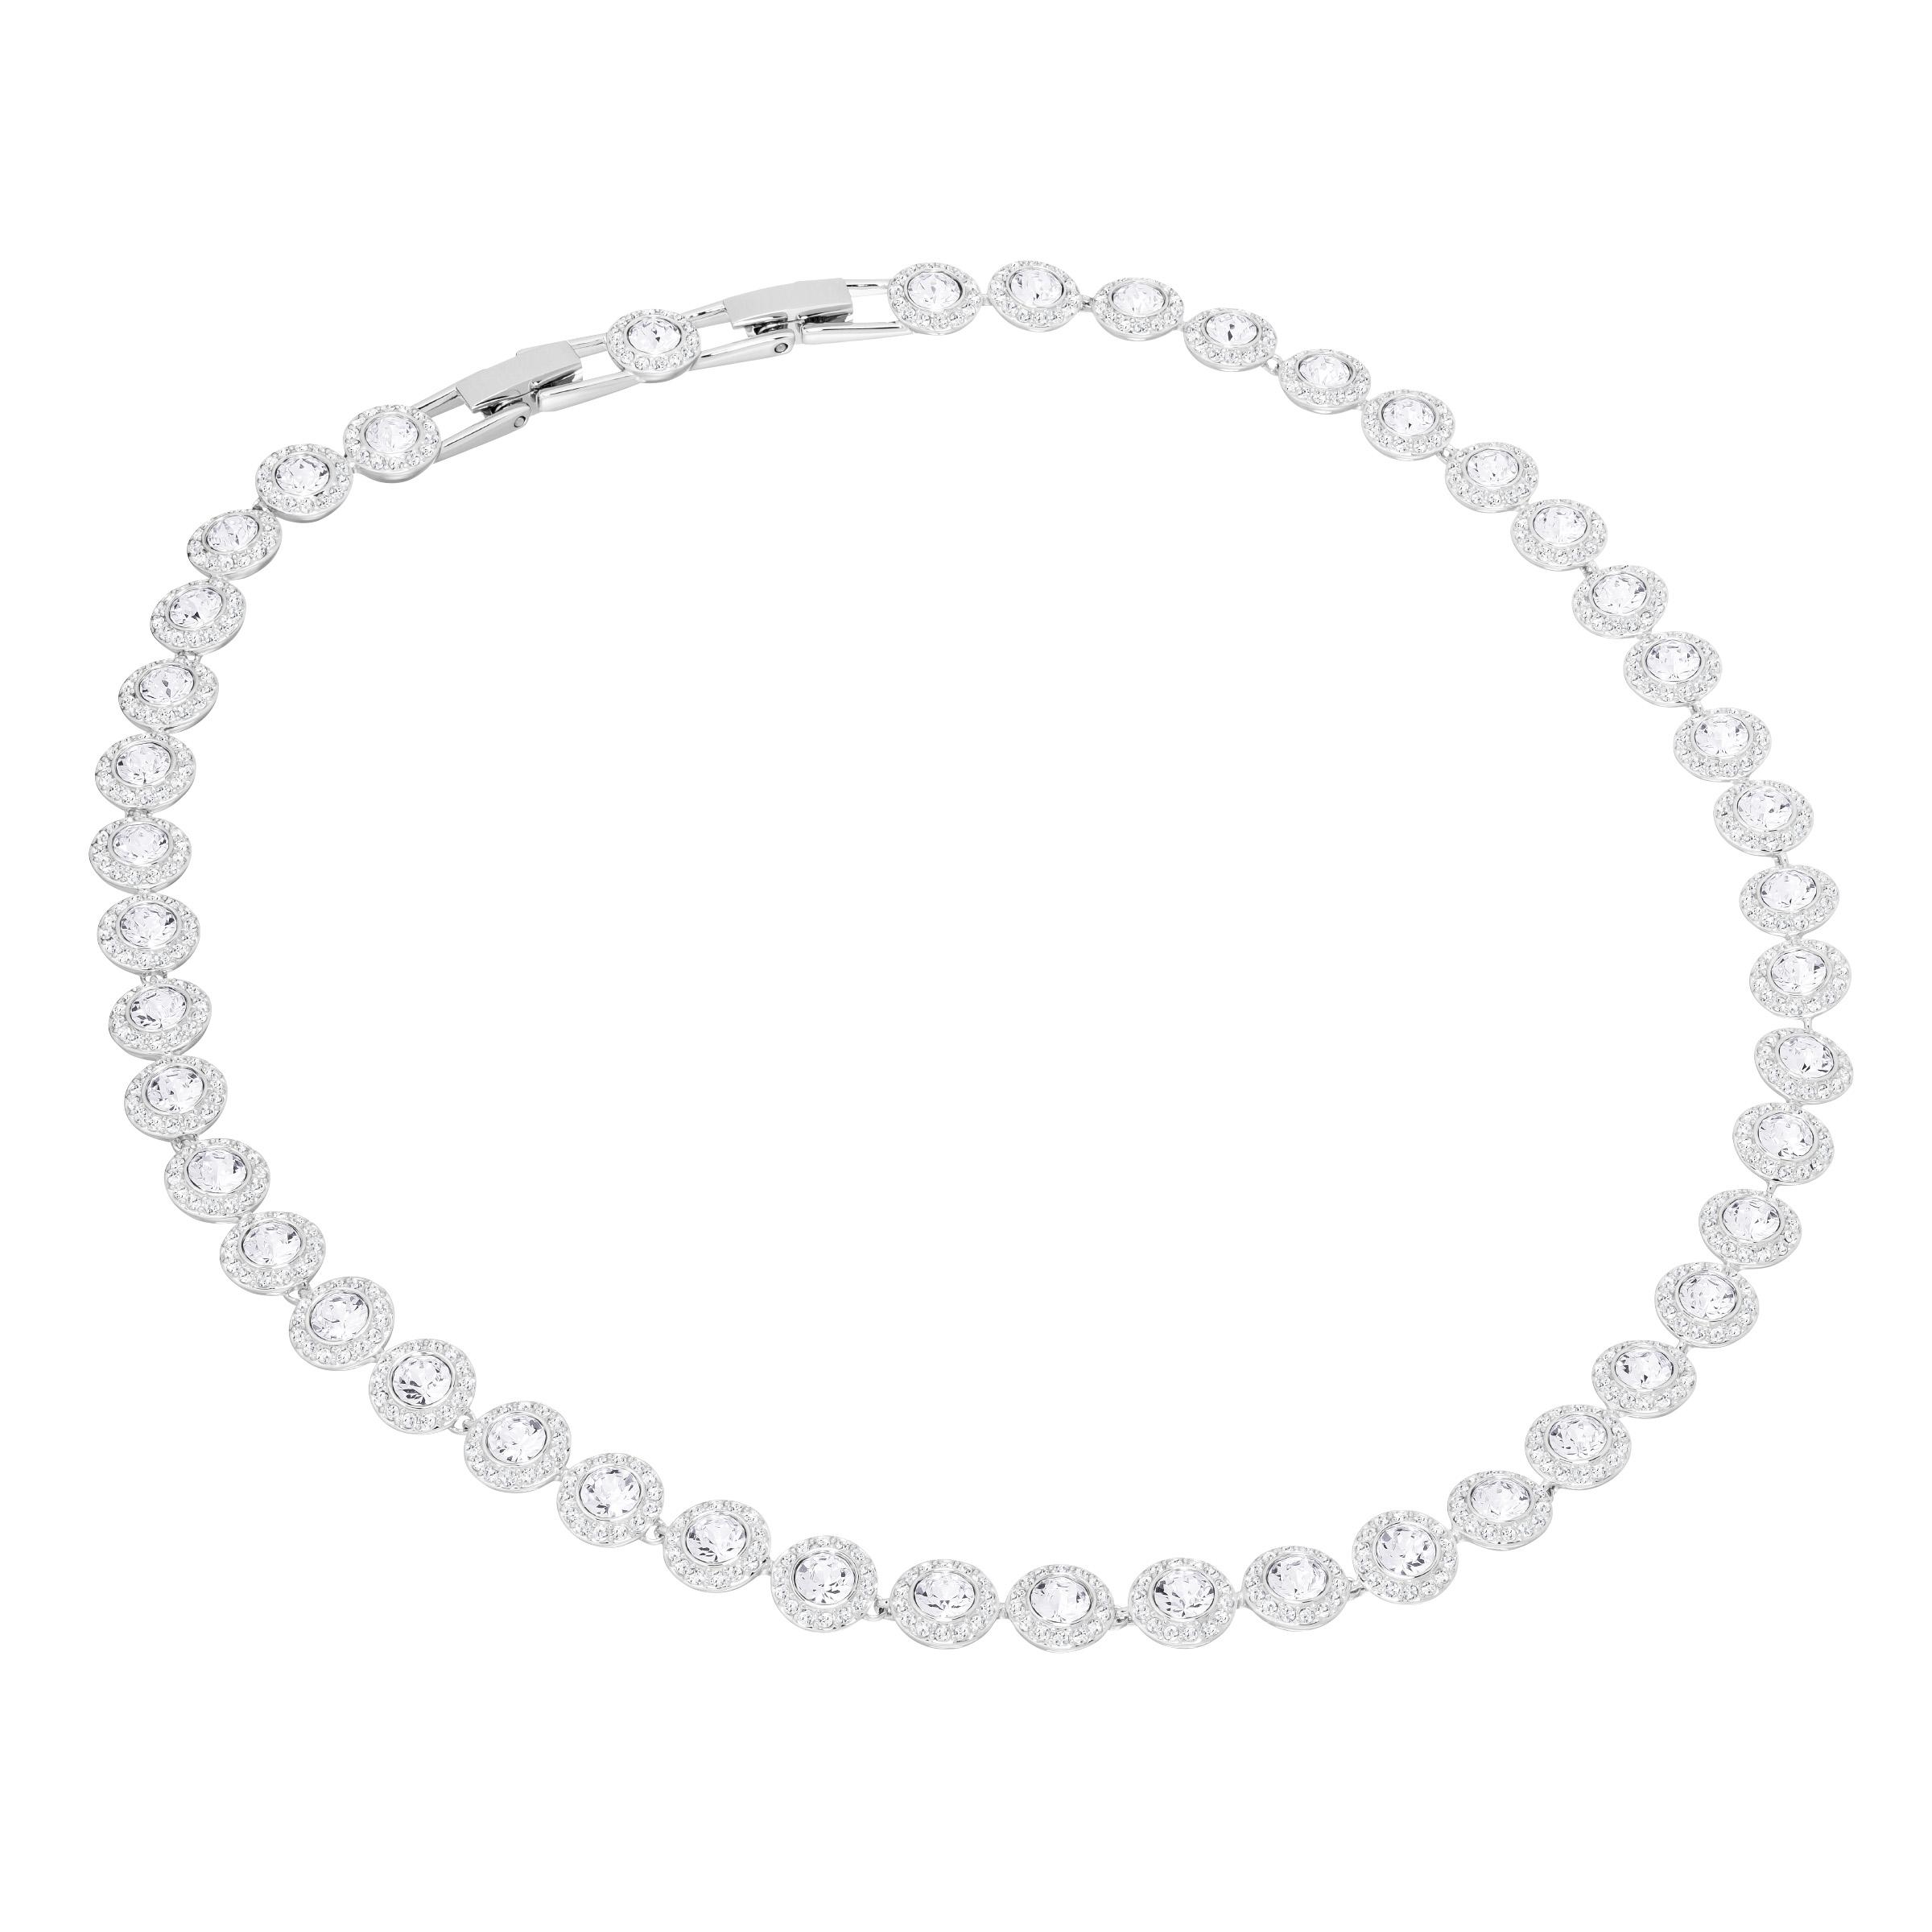 Collier Angelic, blanc, Métal rhodié, Swarovski